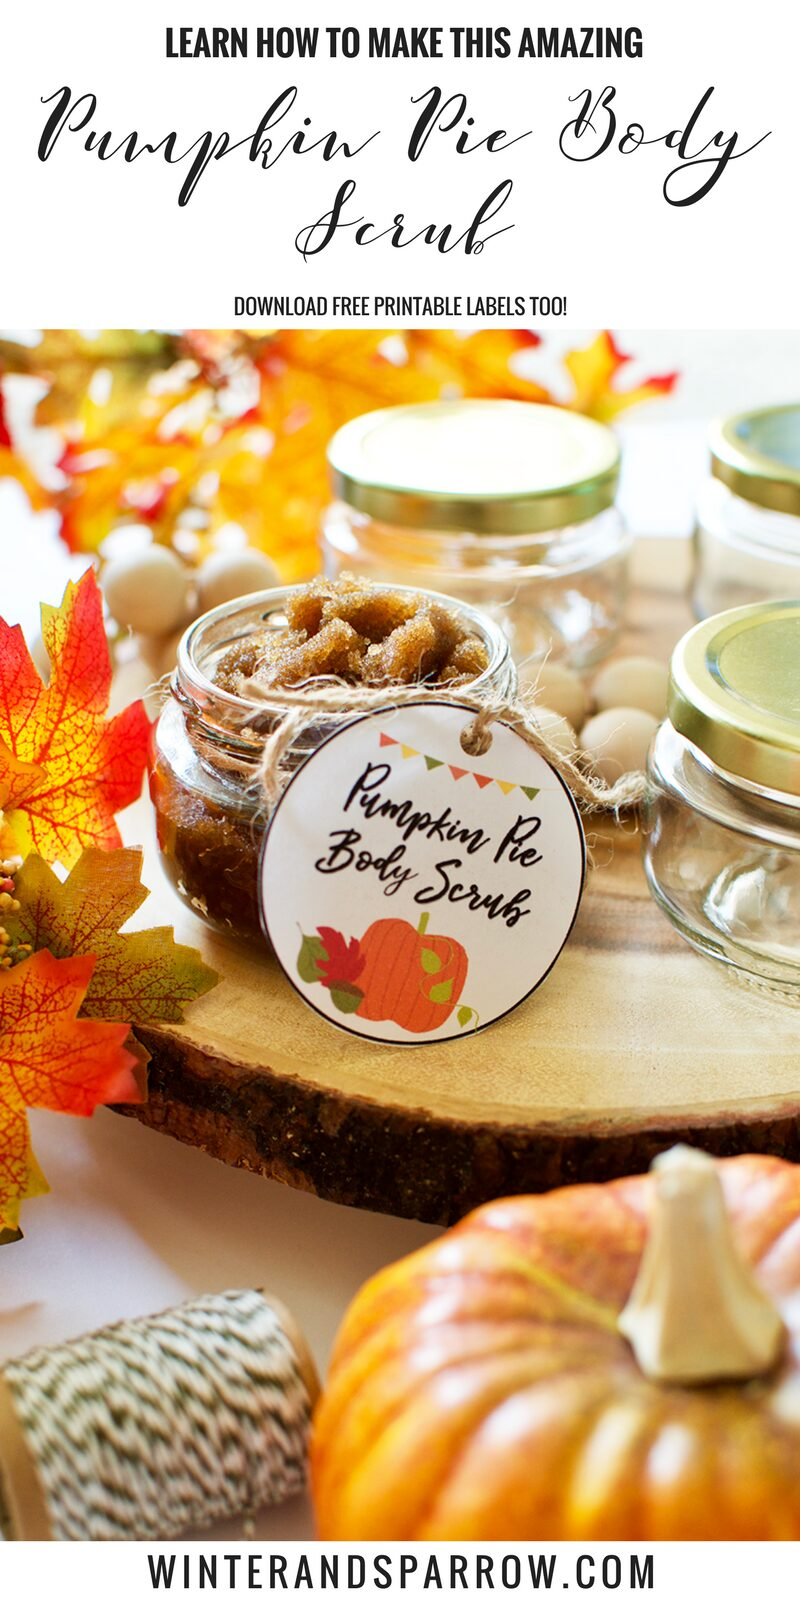 DIY: Amazing Pumpkin Pie Body Scrub + Free Printable Labels #SKSHarvest #SeasonalSolutions #ad winterandsparrow.com